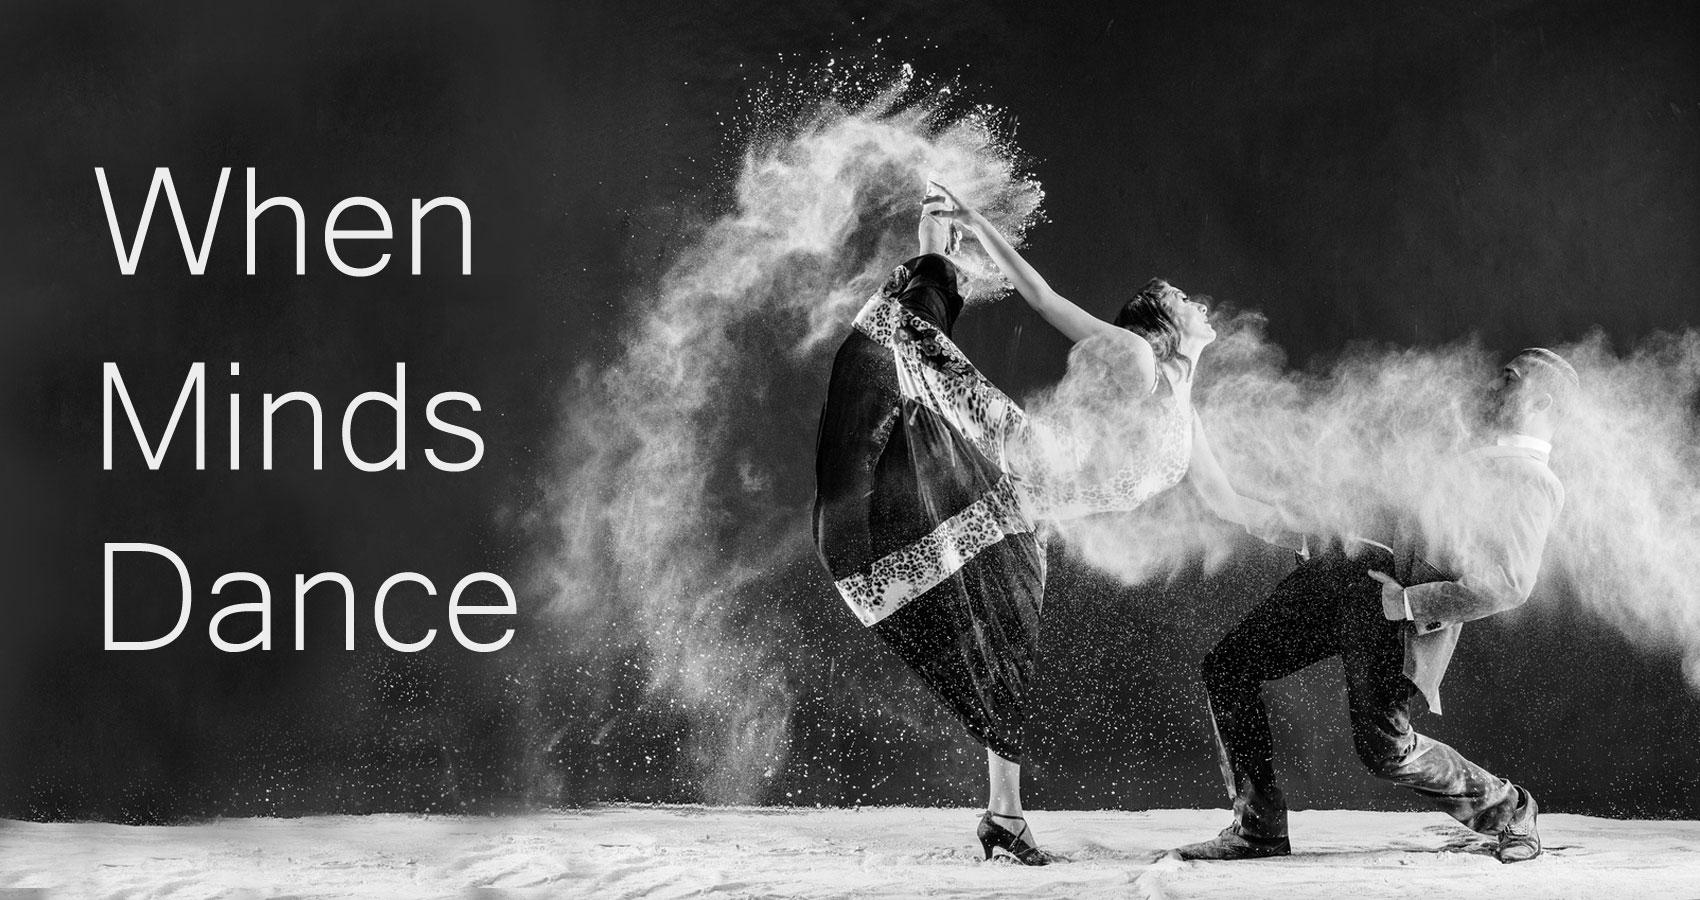 When Minds Dance at Spillwords.com